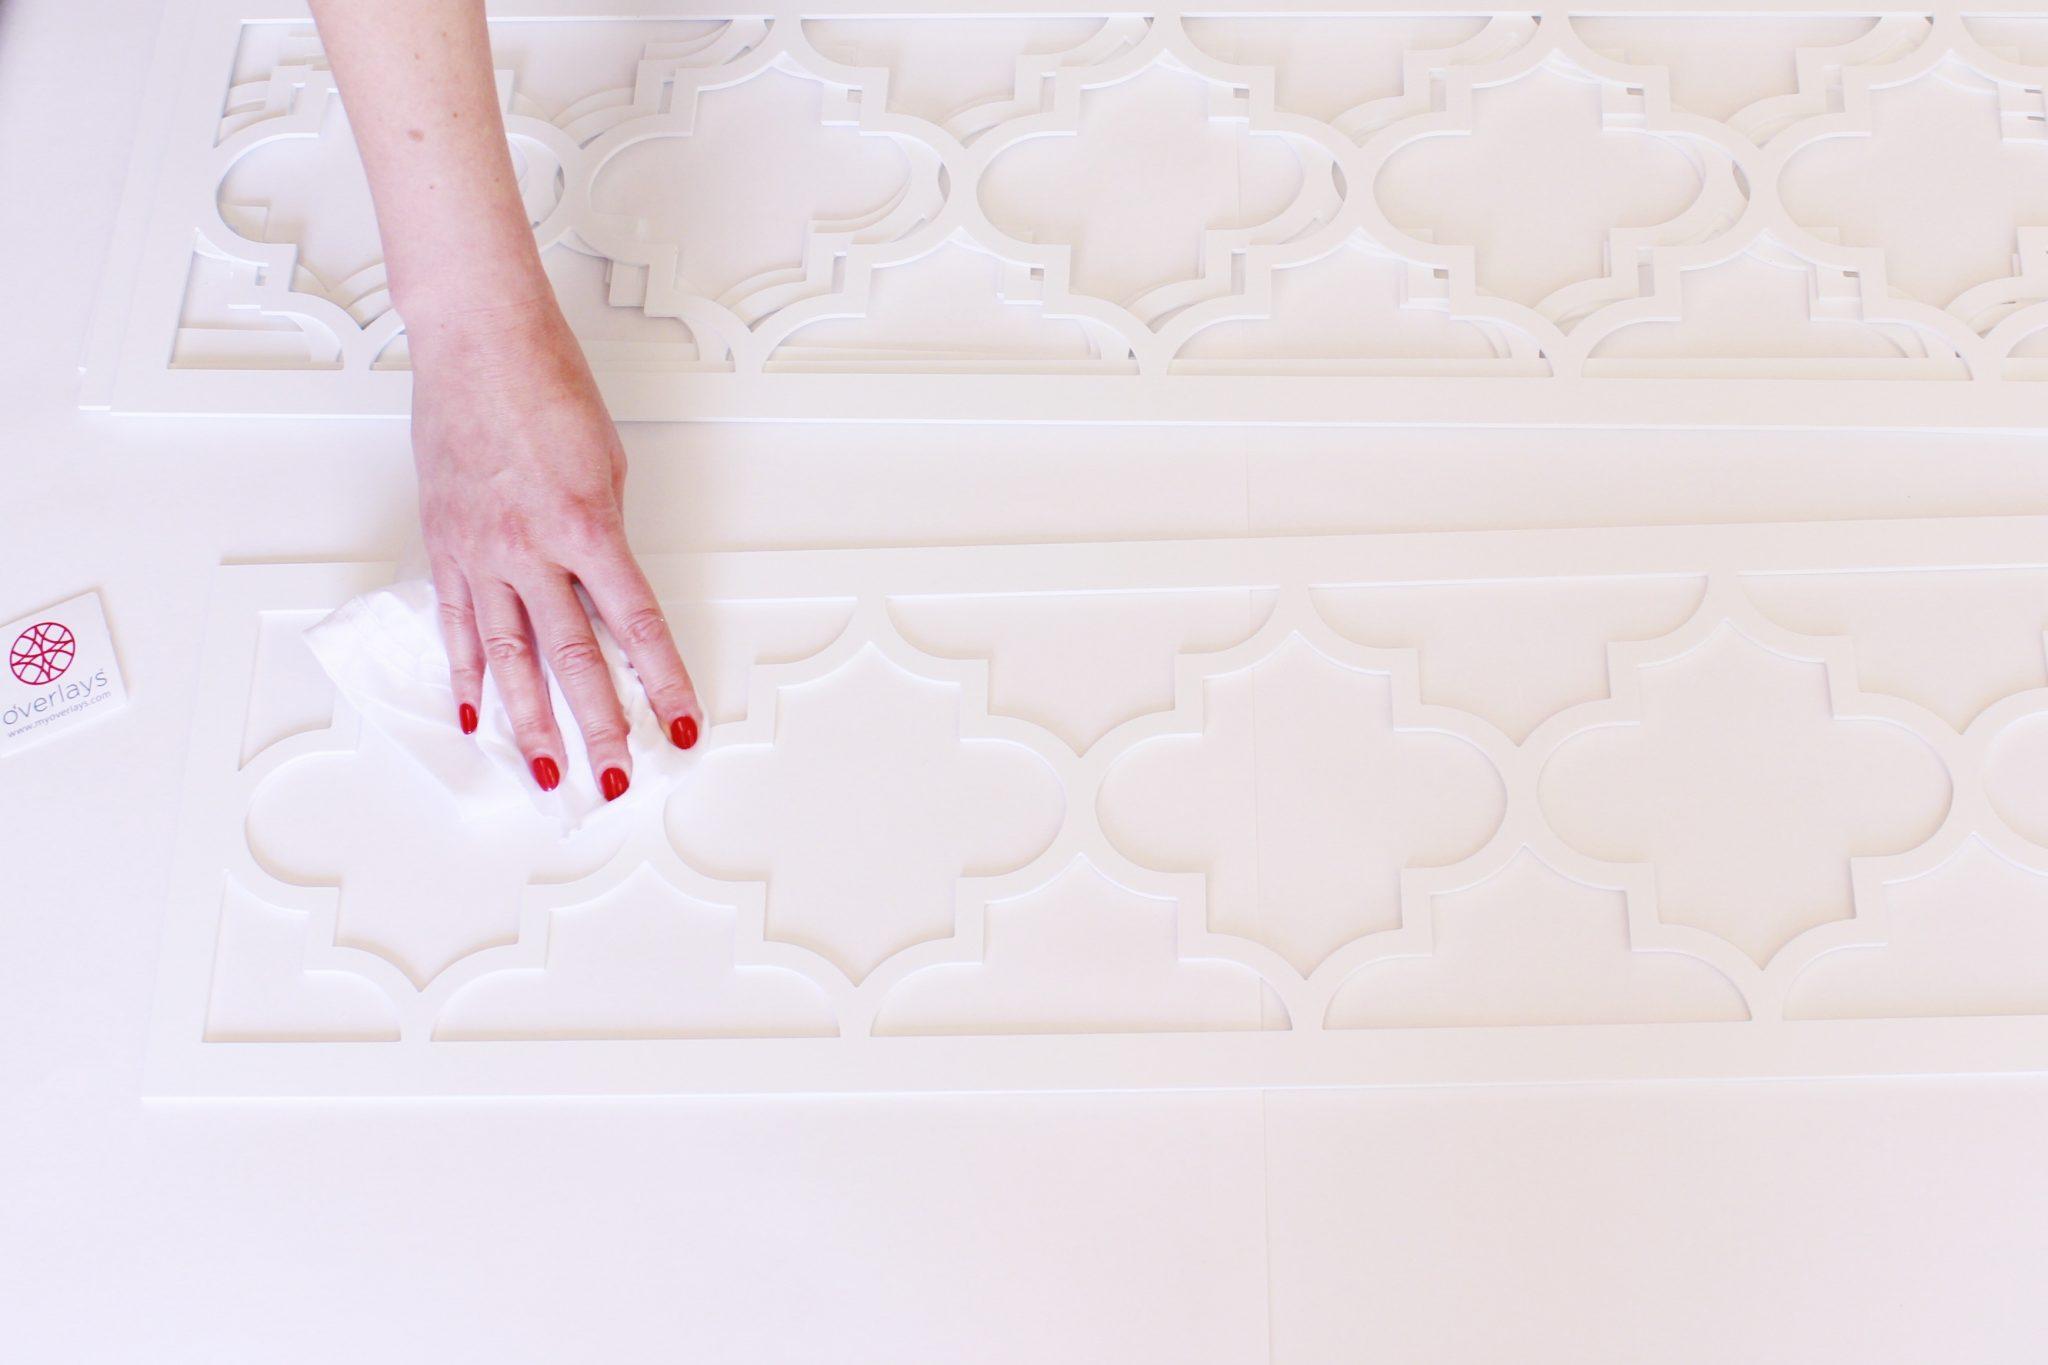 DIY Ikea Dresser Hack | Wipe Down O'verlays With Rubbing Alcohol